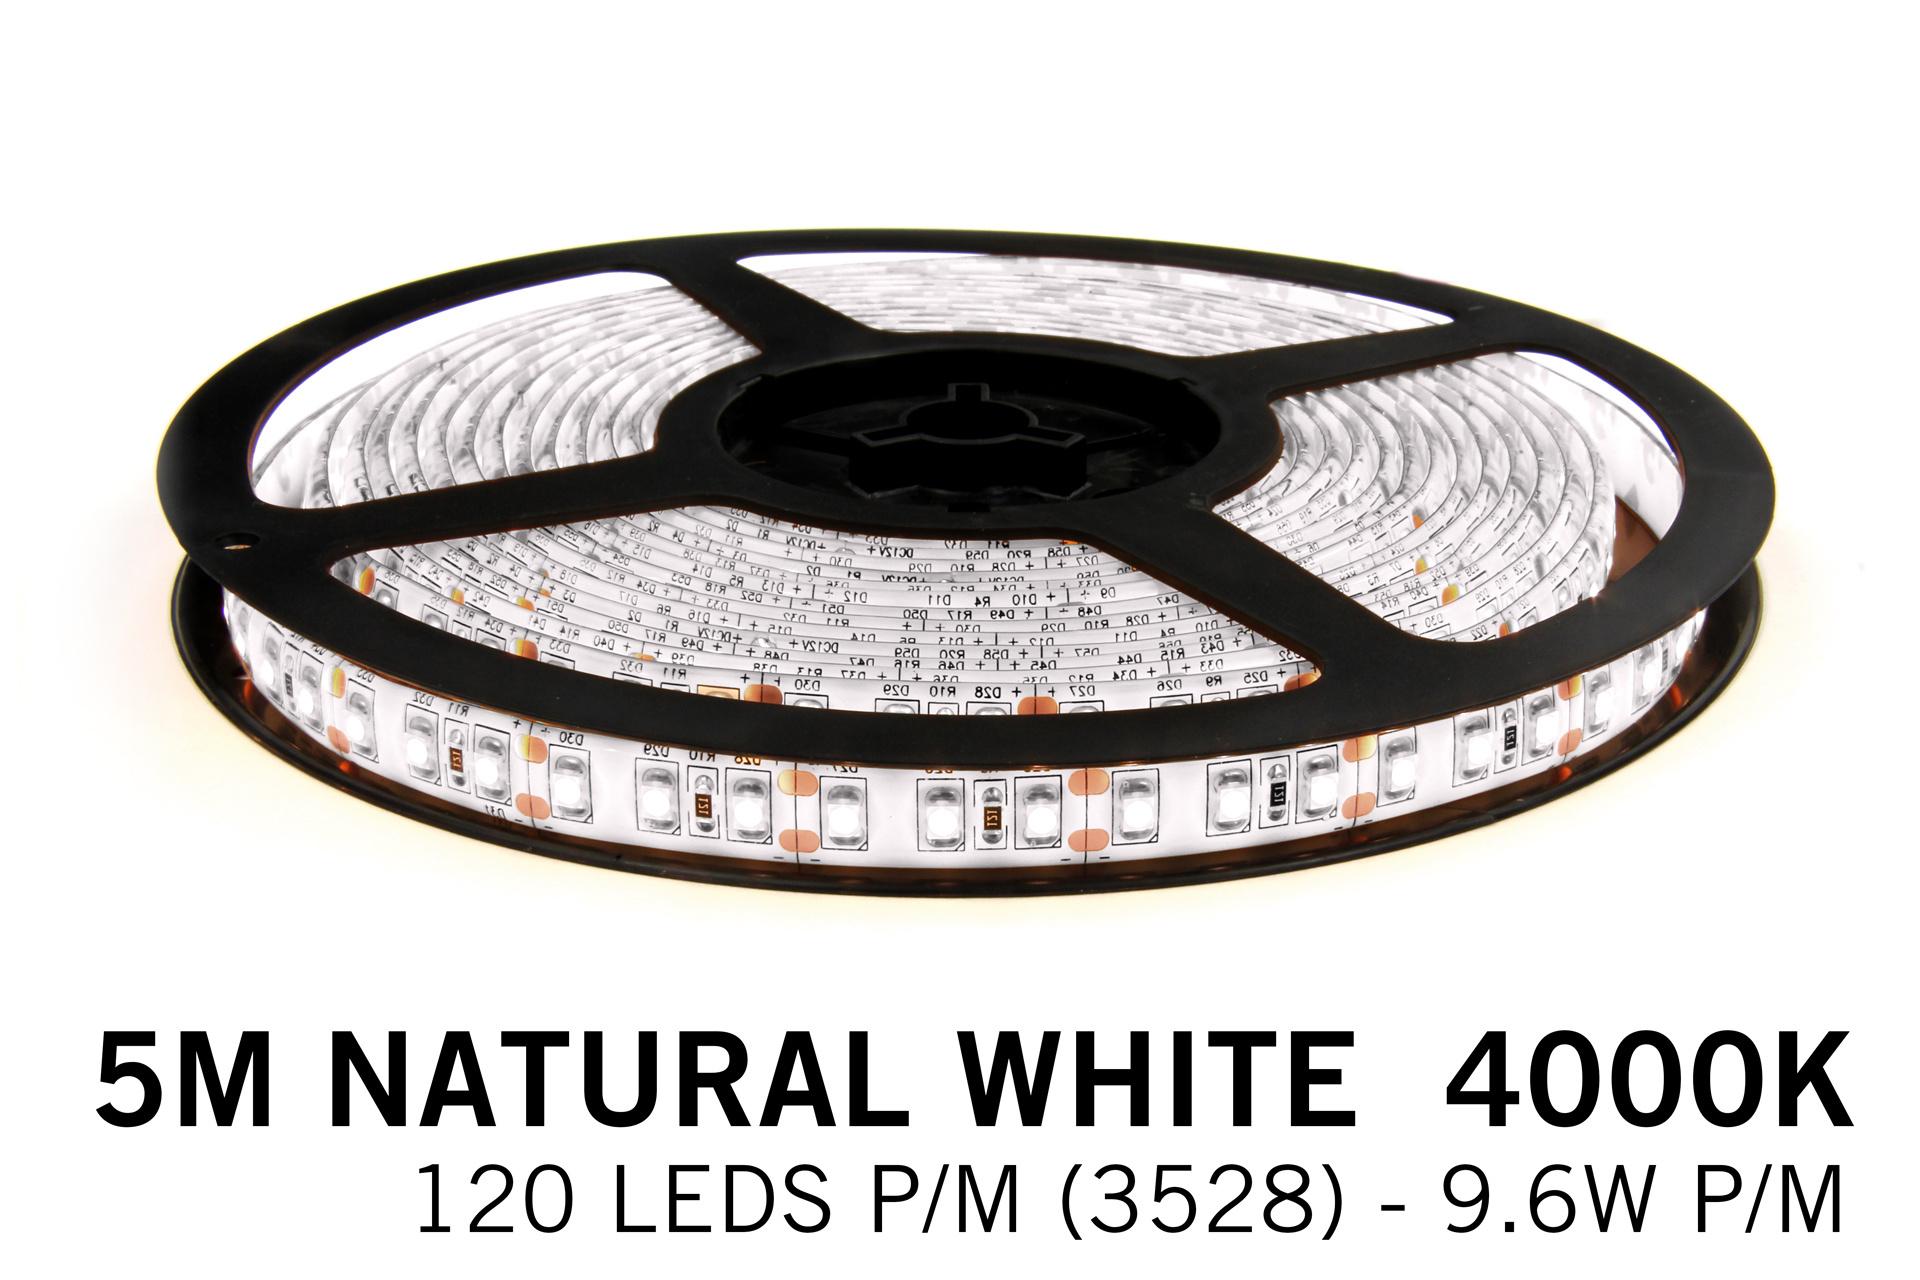 Neutraal Witte LED strip 120 leds p.m. - 5M - type 2835 - 12V - 9,6 W p.m.